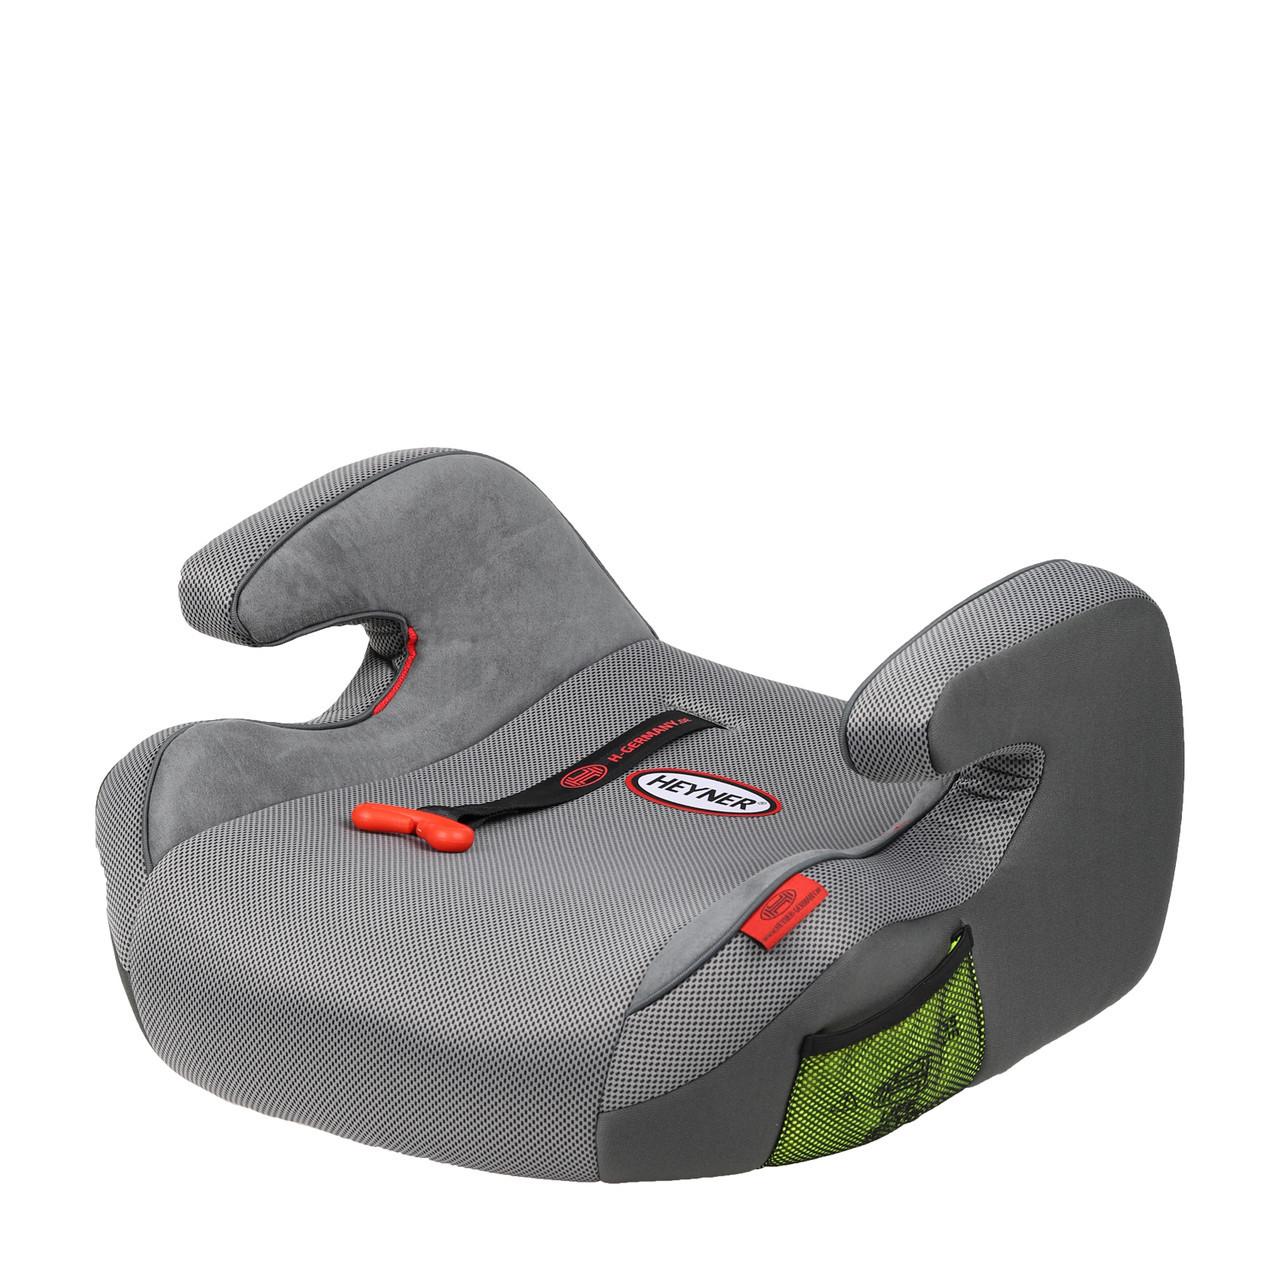 Бустер Heyner SafeUp Comfort  XL (II + III) Koala Grey 783 200 серый 15-36 кг